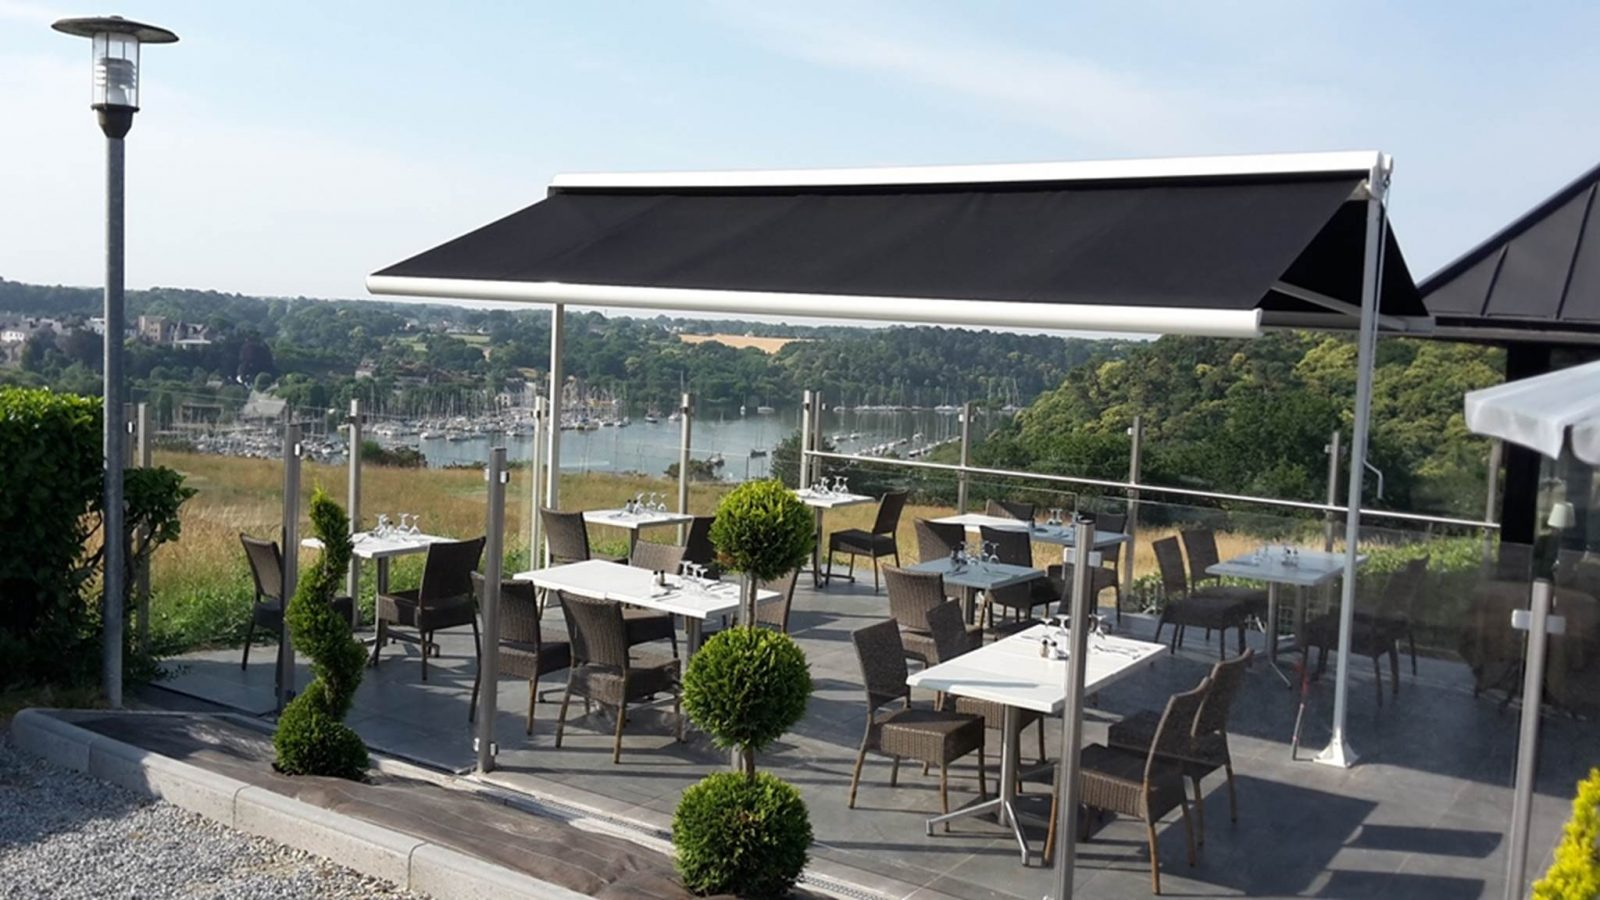 Le Relais de la Roche-La Roche-Bernard-Damgan La Roche-Bernard Tourisme